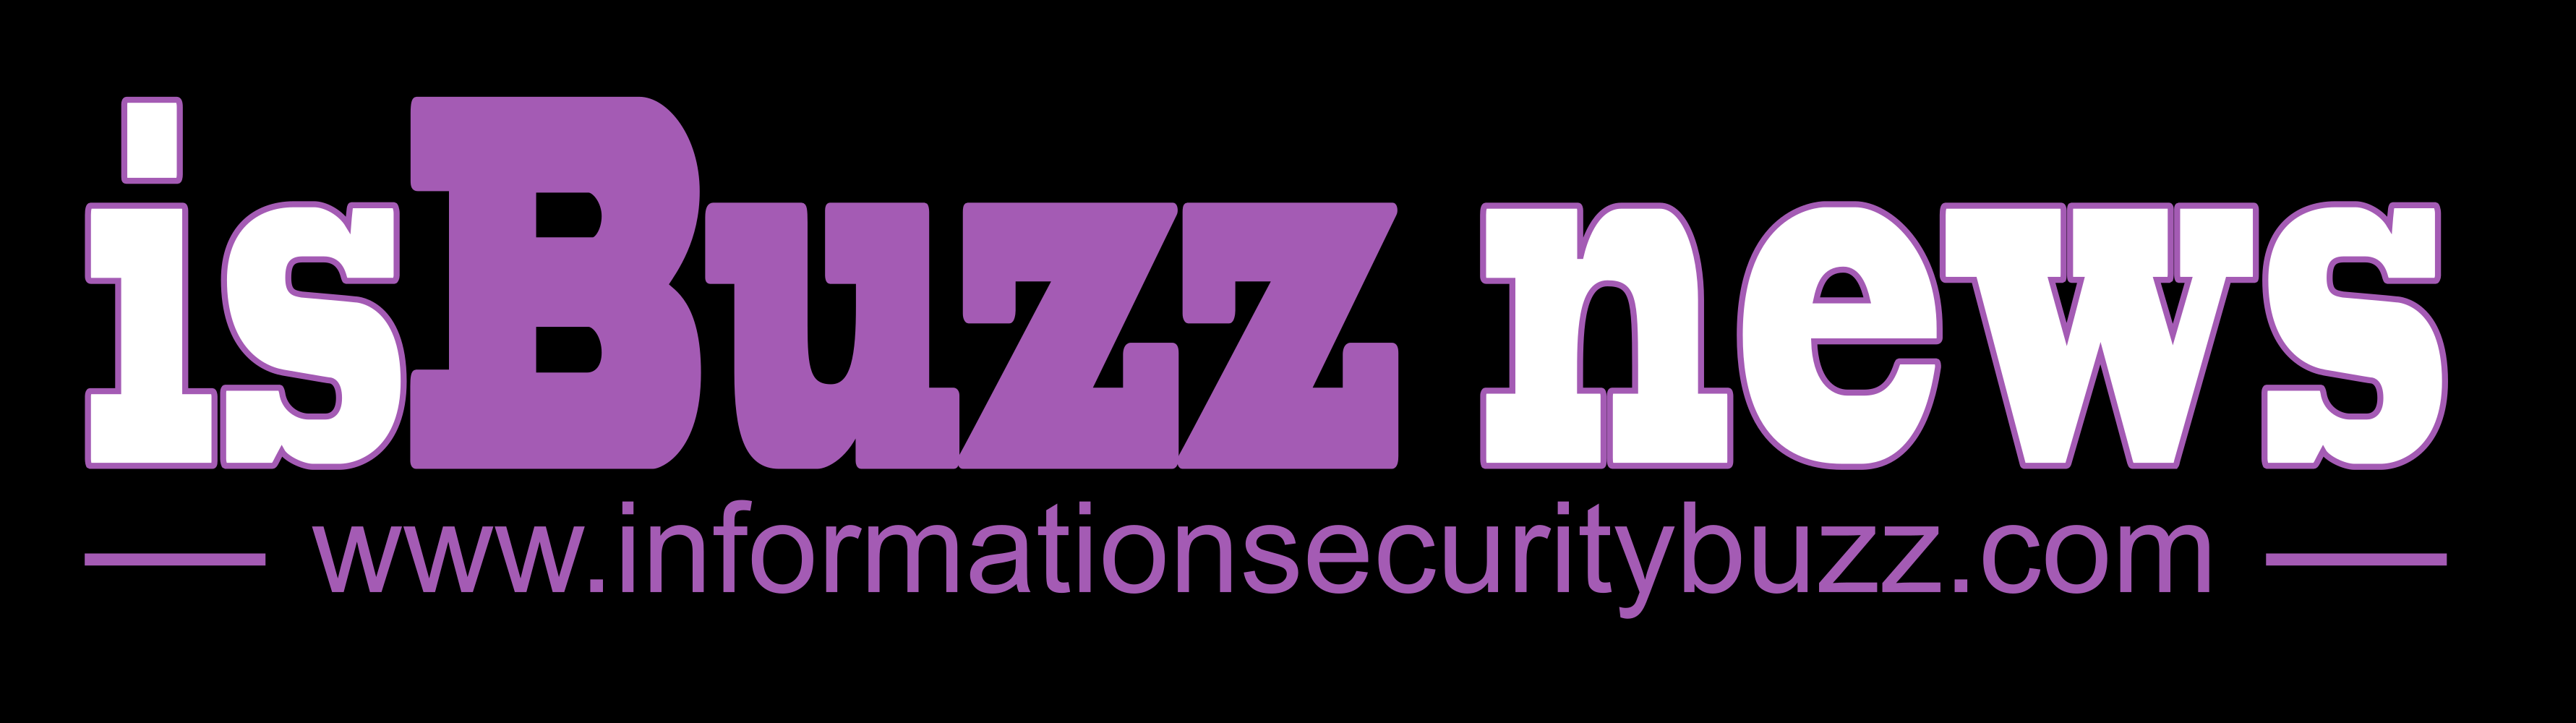 isbuzz-news-logo-HR-black-bk-small